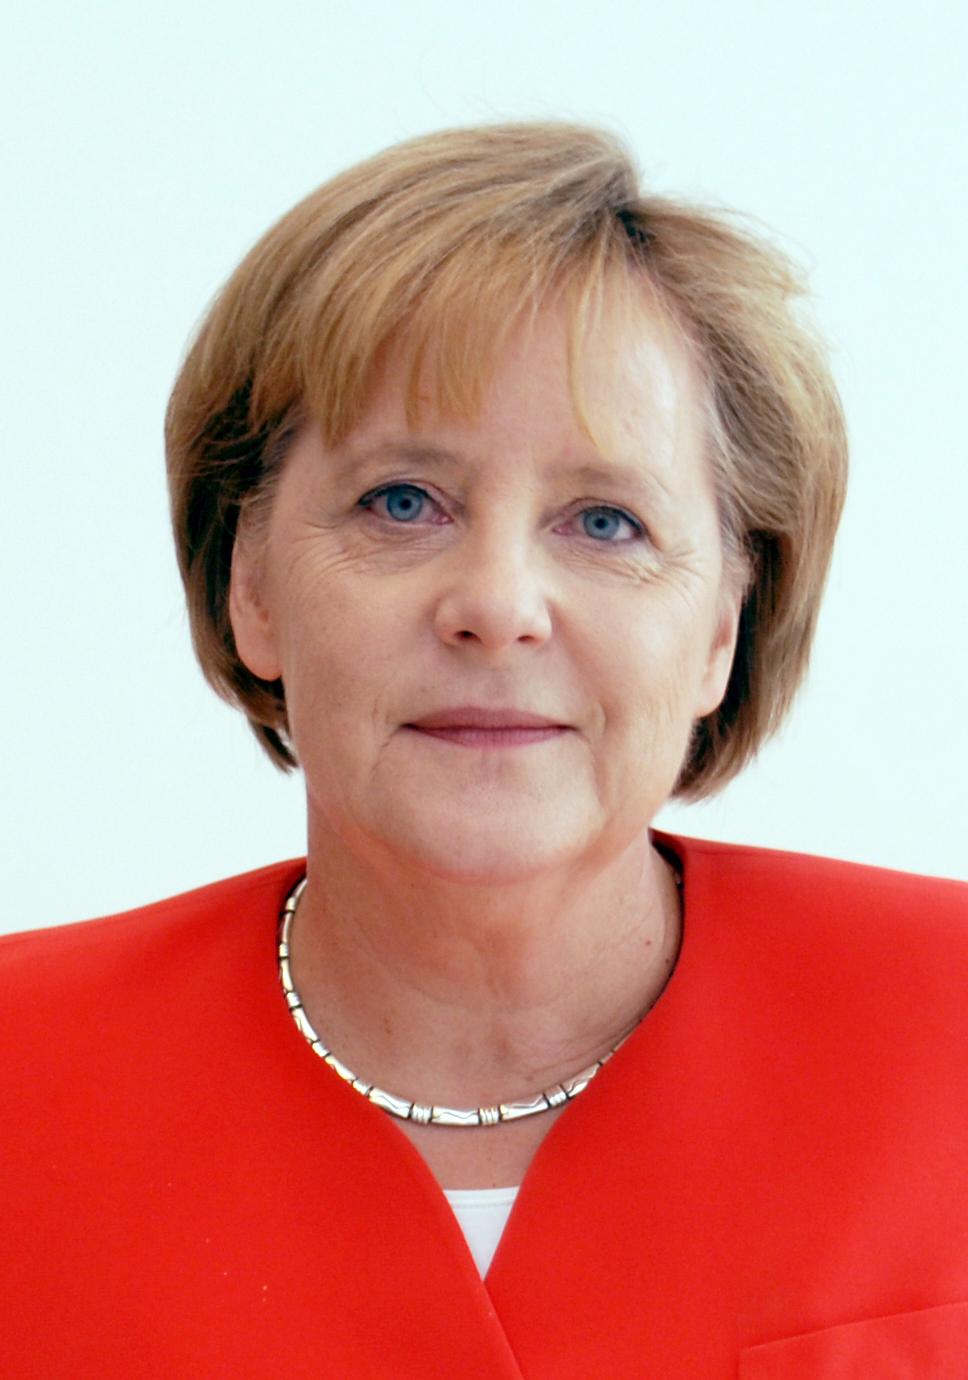 Angela Merkel. Credit: Wikimedia Commons.